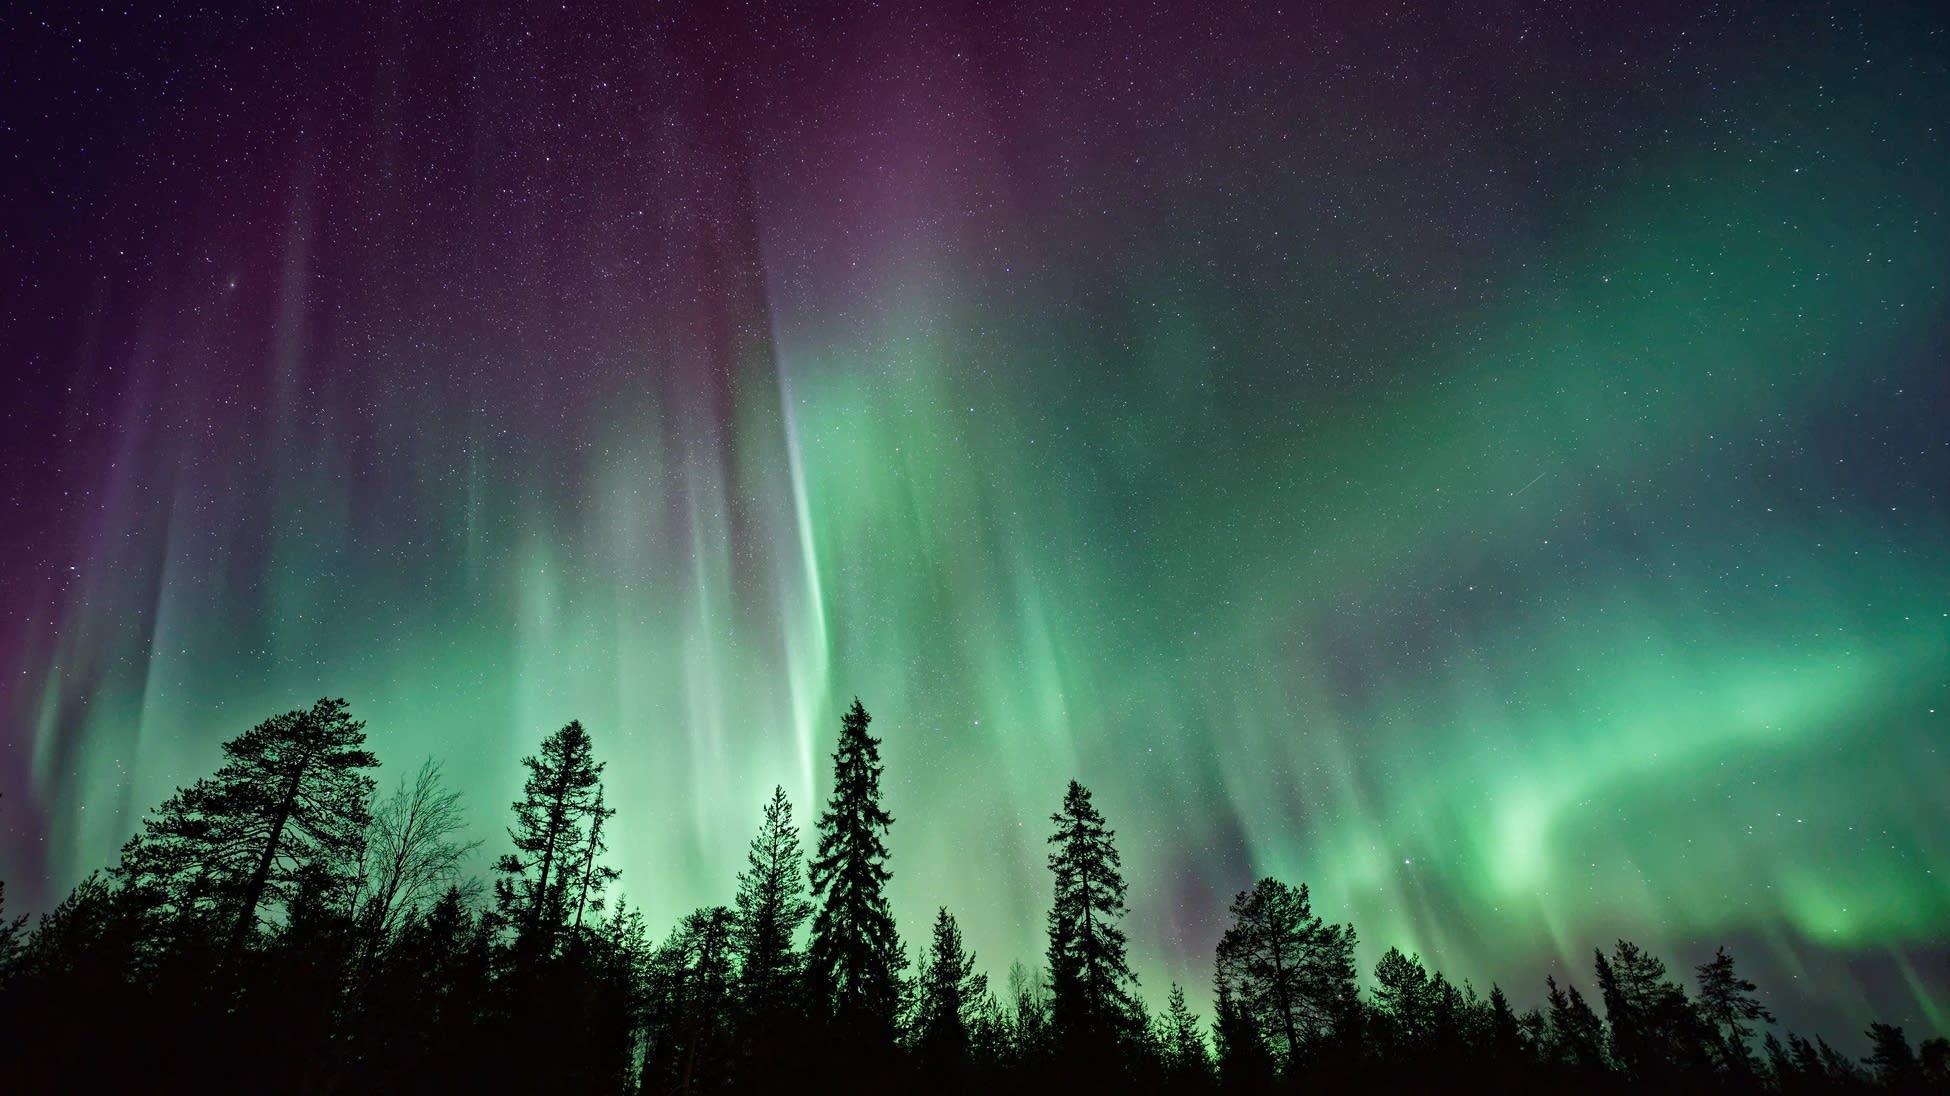 The Aurora Borlealis.